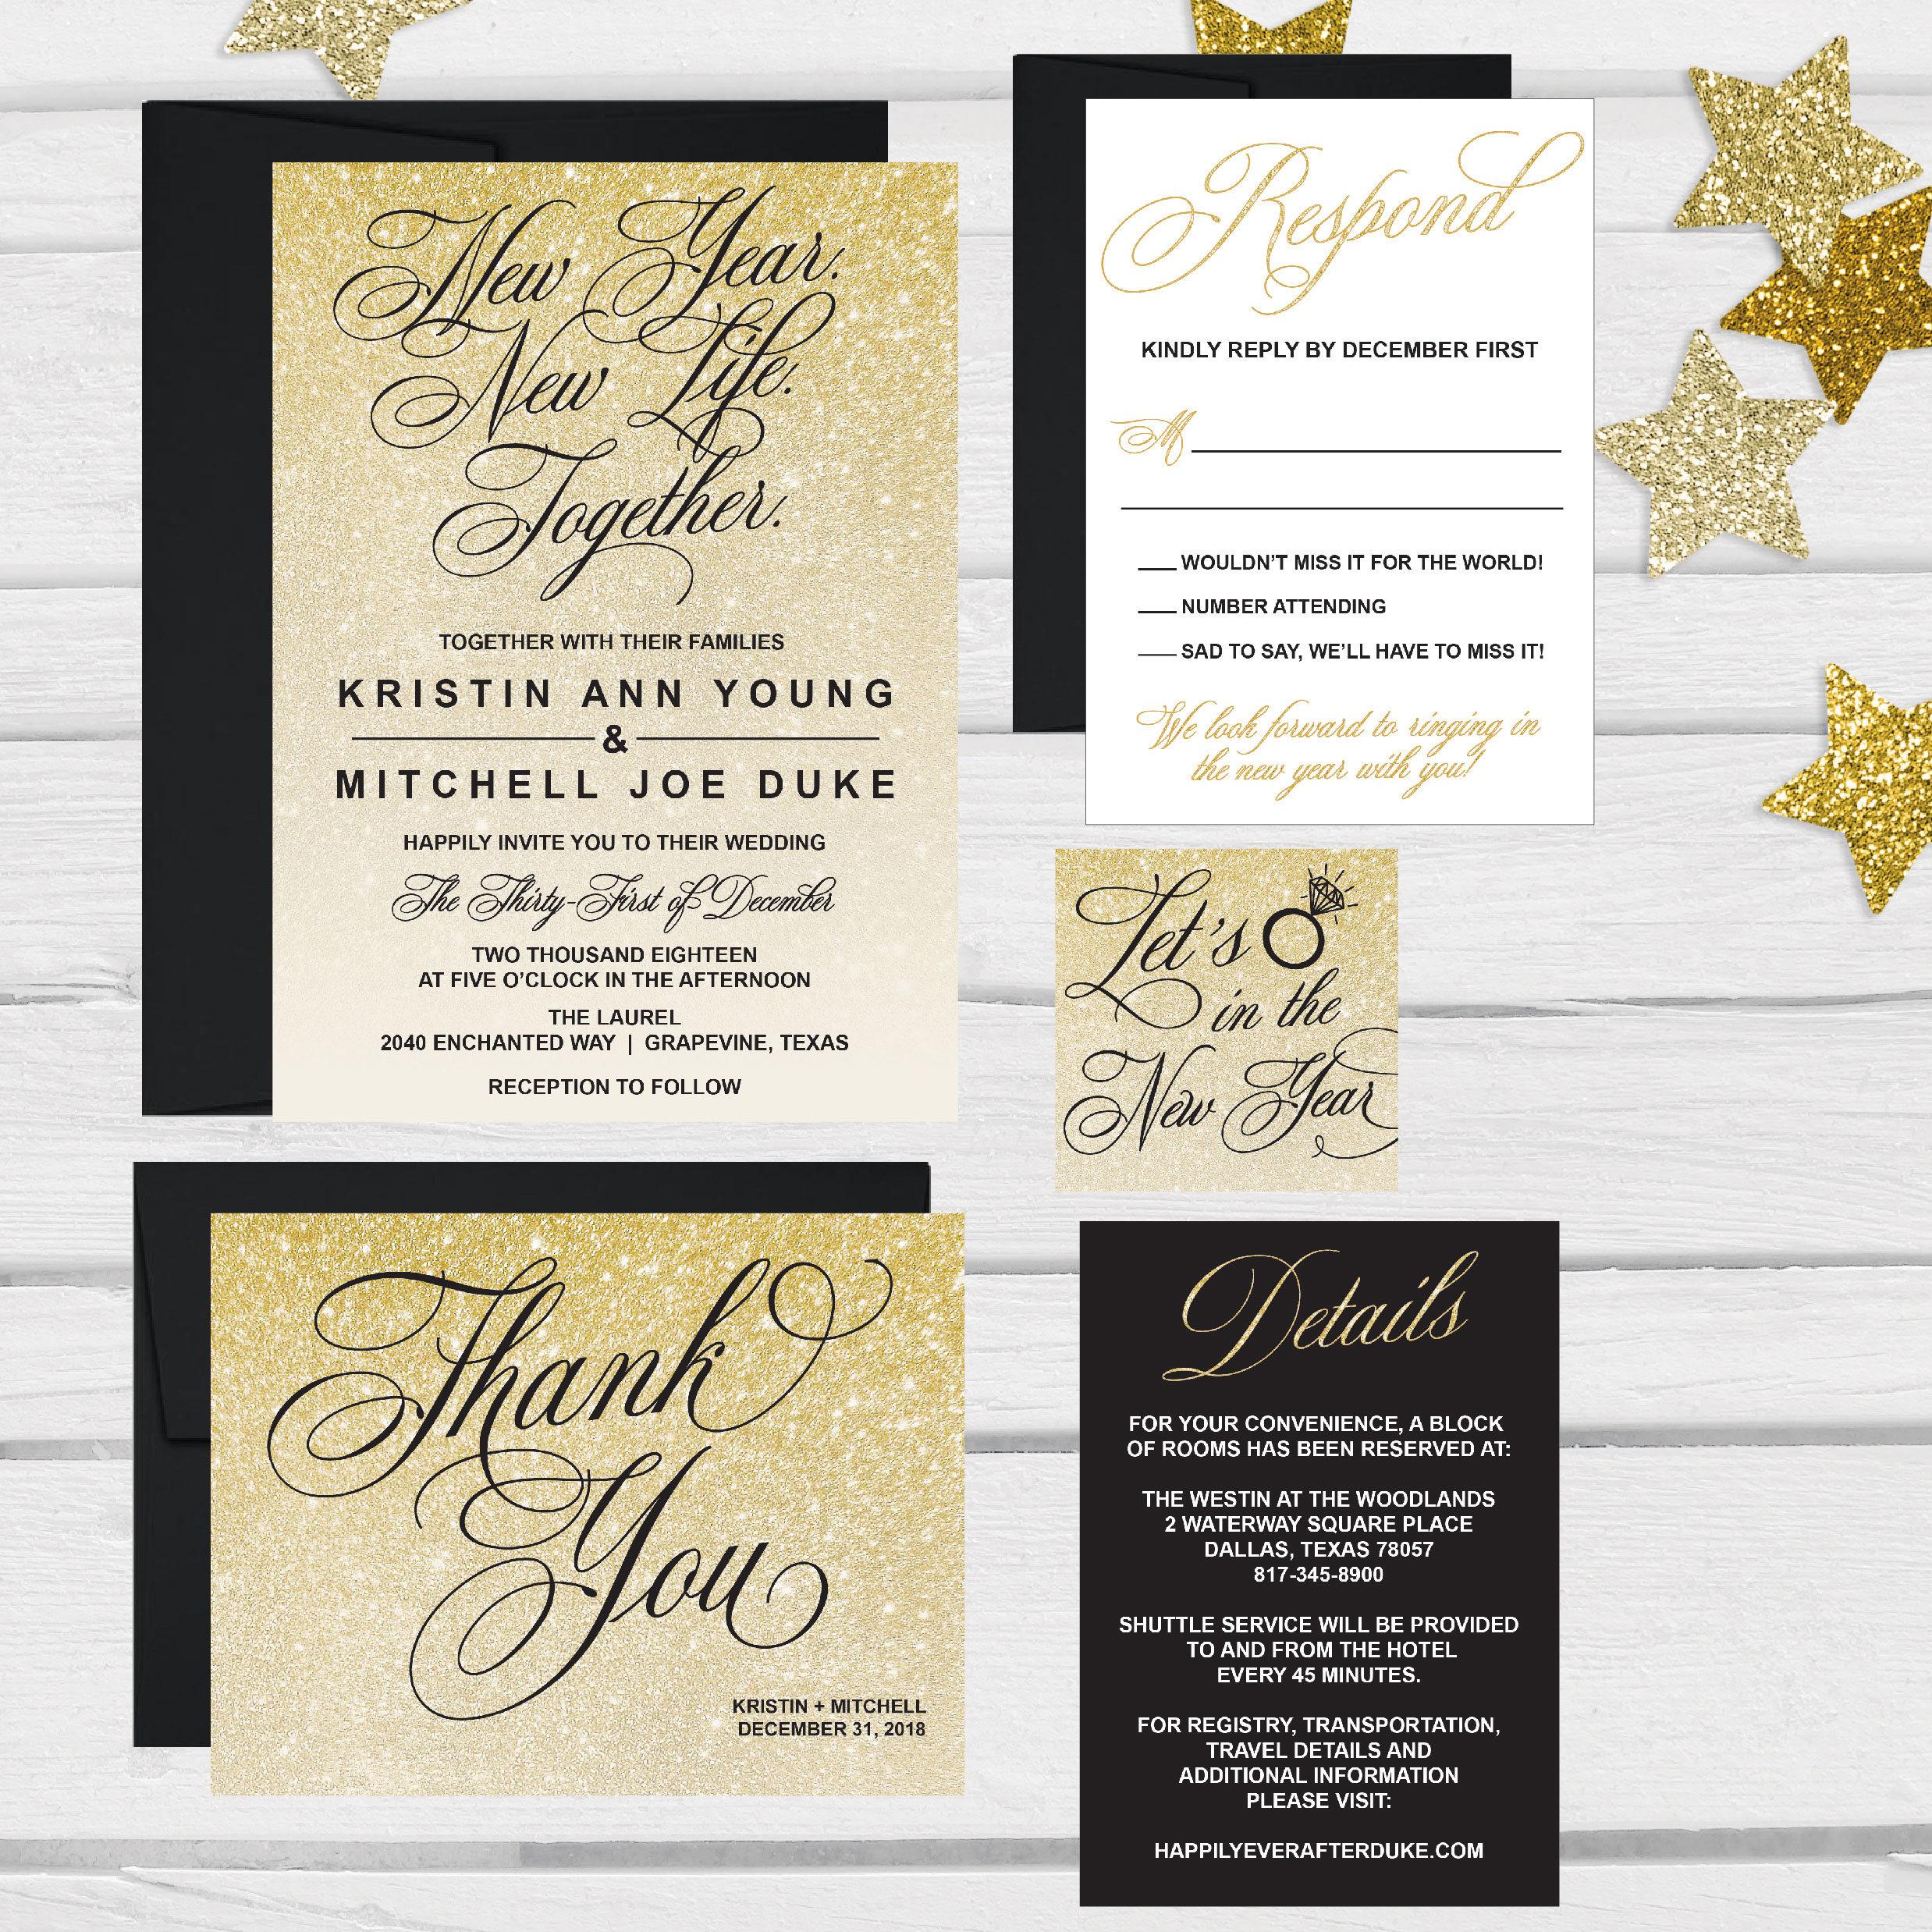 Elegant New Years Eve Wedding Invitation Template Glitter